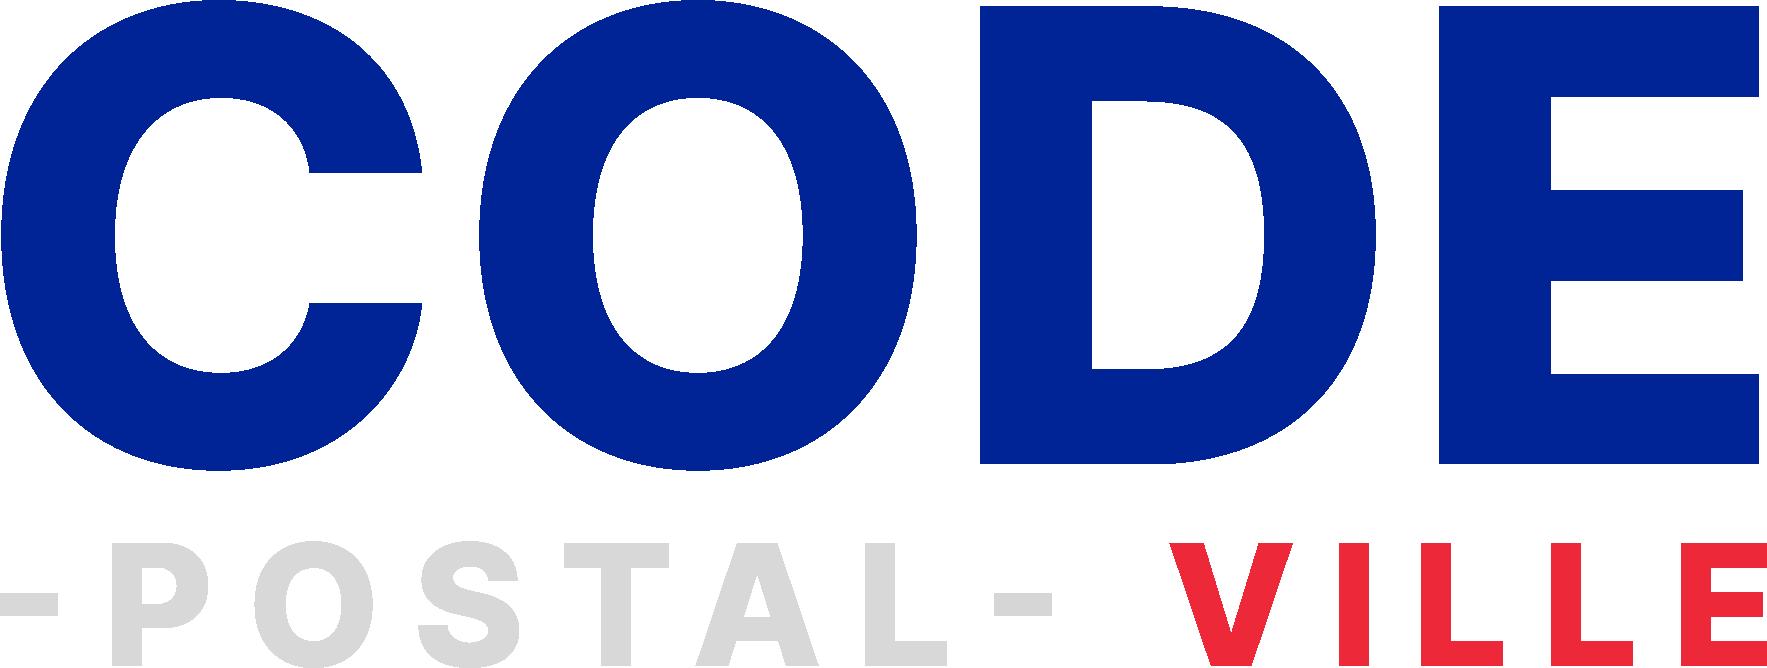 Code Postal Villes